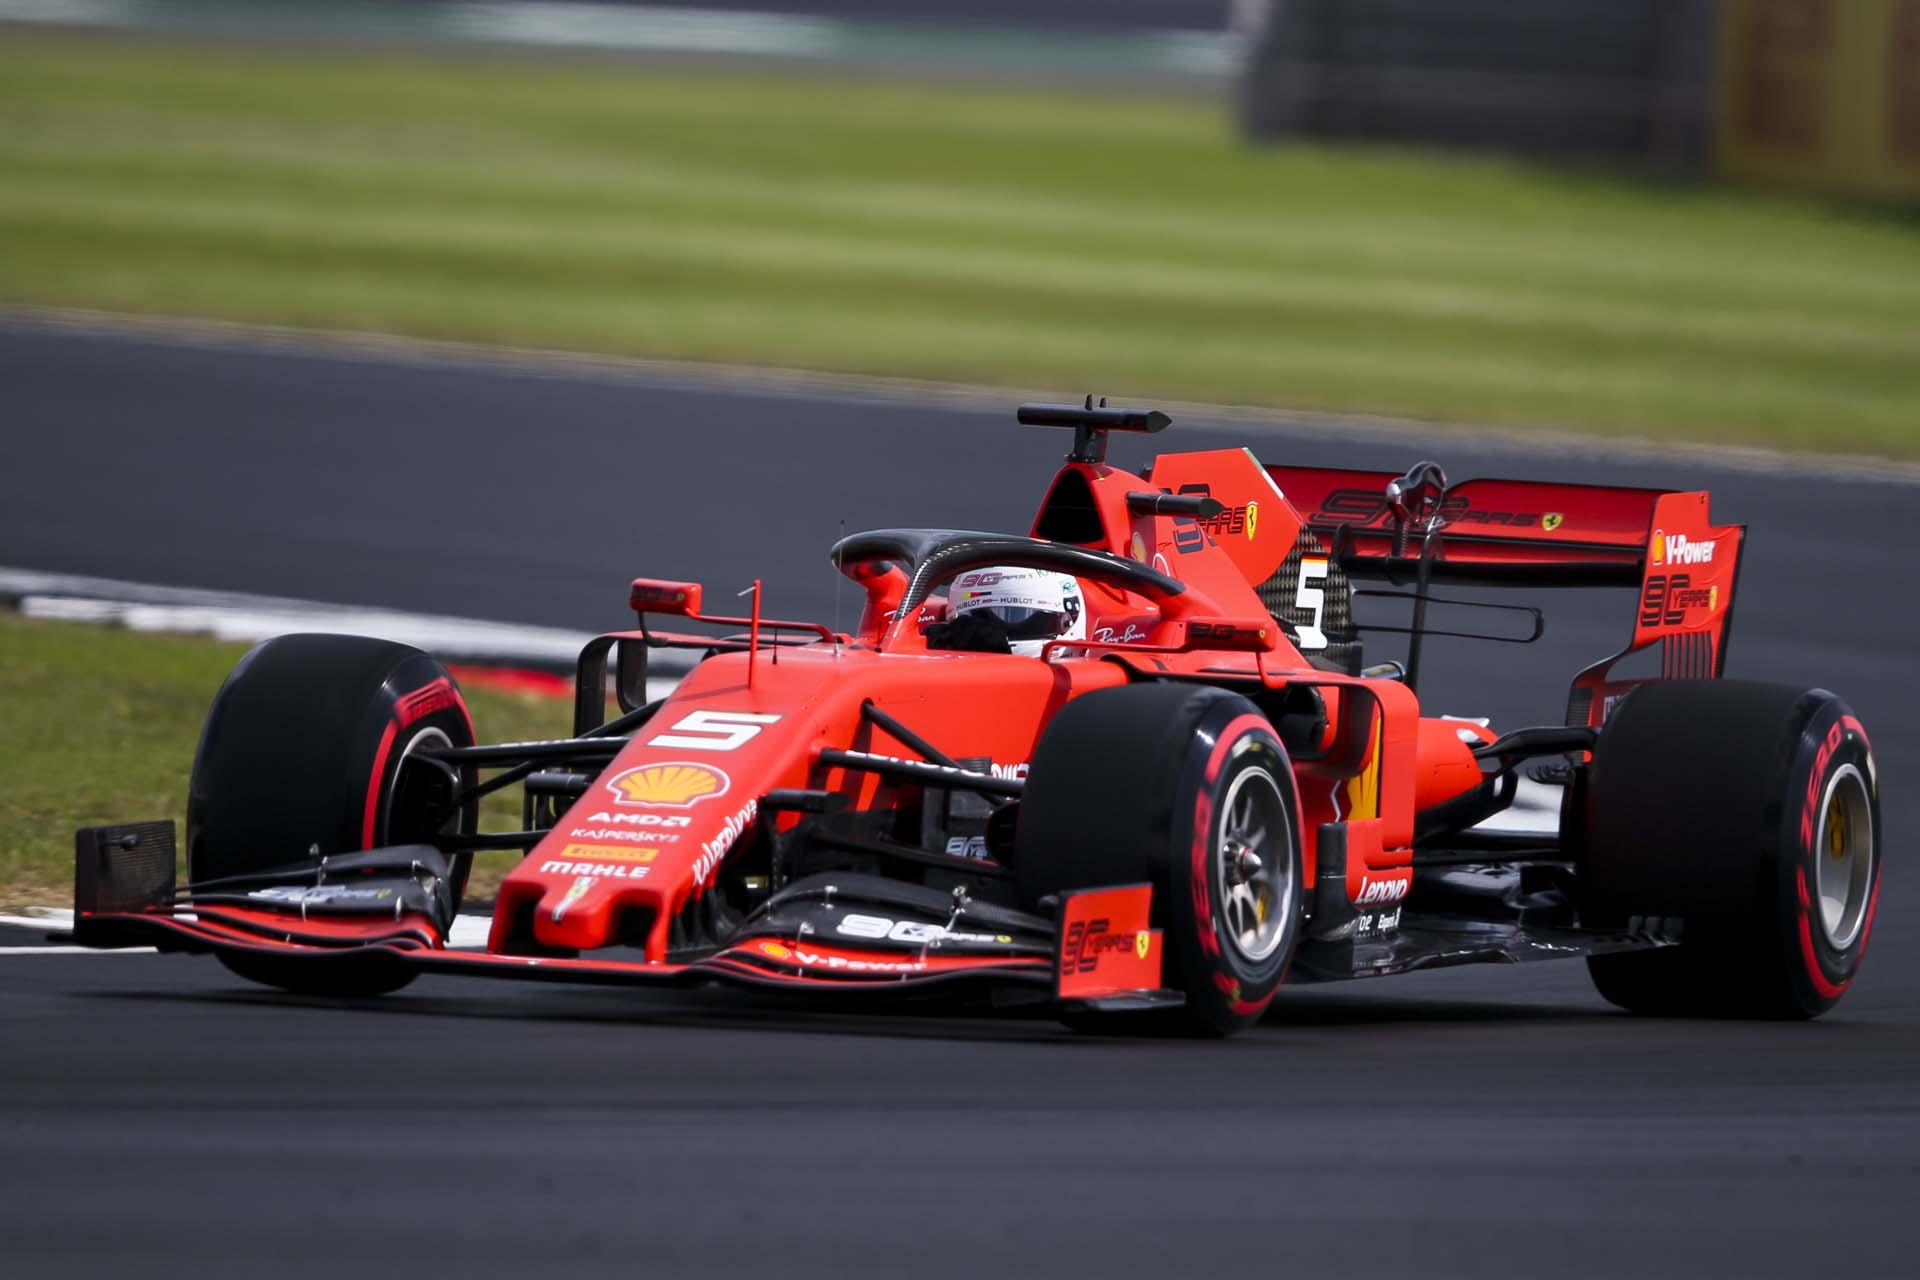 SILVERSTONE, UNITED KINGDOM - JULY 12: Sebastian Vettel, Ferrari SF90 during the British GP at Silverstone on July 12, 2019 in Silverstone, United Kingdom. (Photo by Dom Romney / LAT Images)